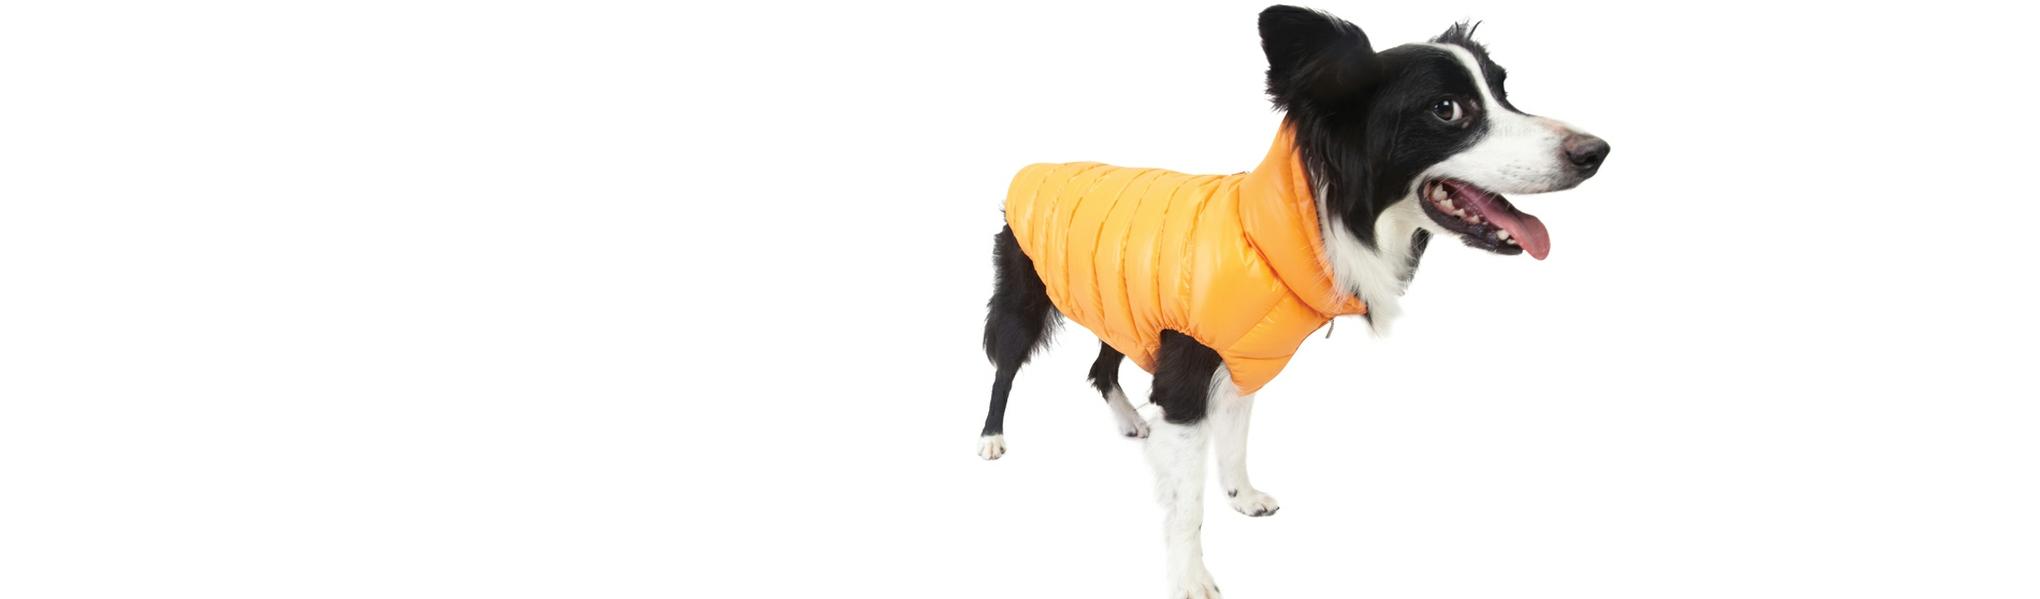 Dogaholic-Puppy-Angel-Coat-Slider